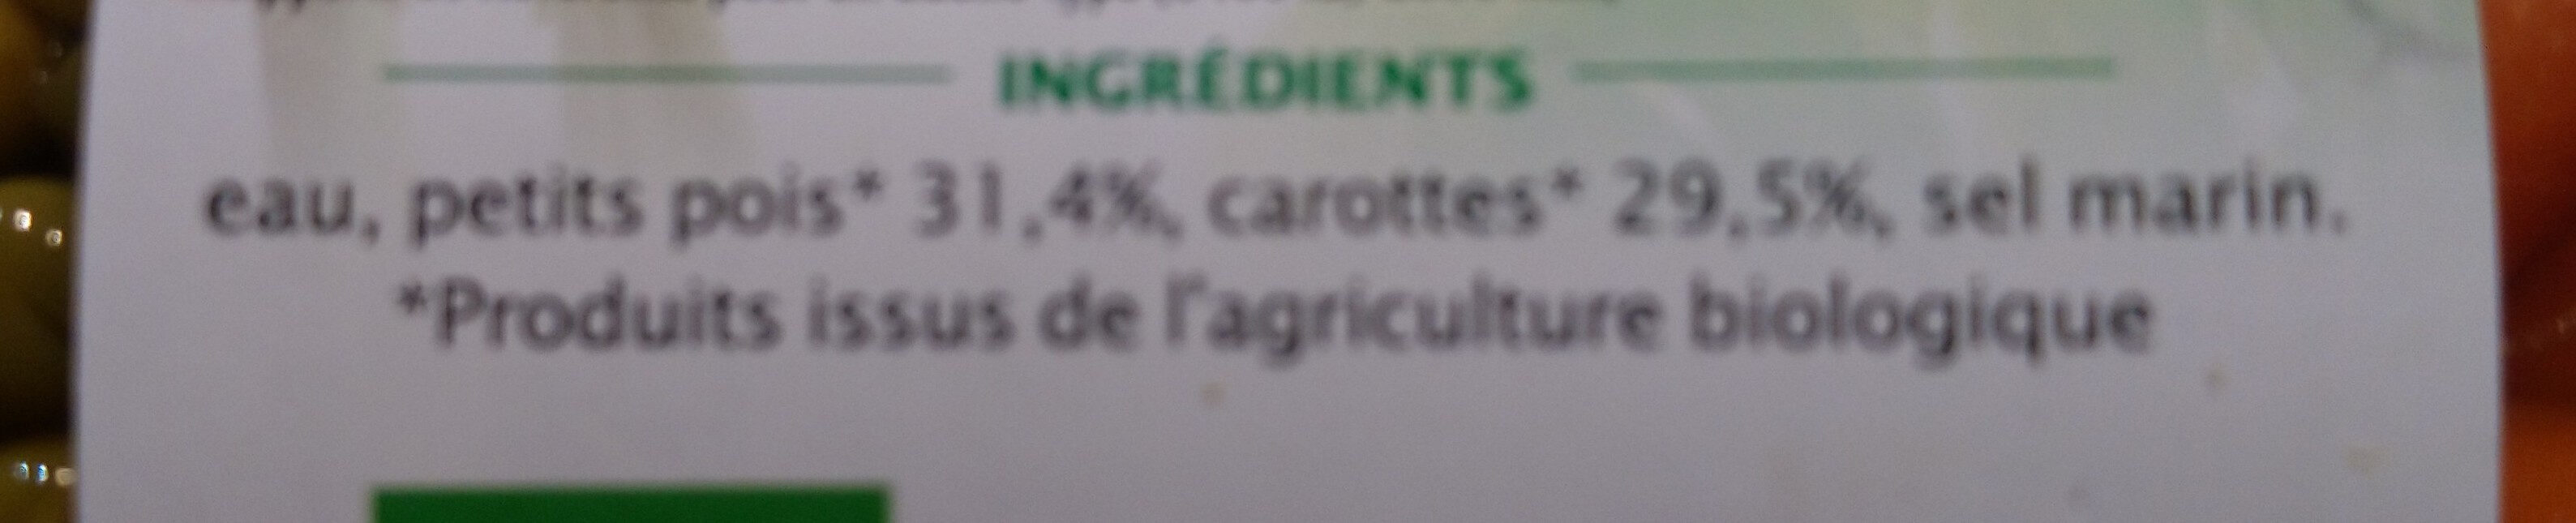 Petits pois et jeunes Carottes - Ingredienti - fr